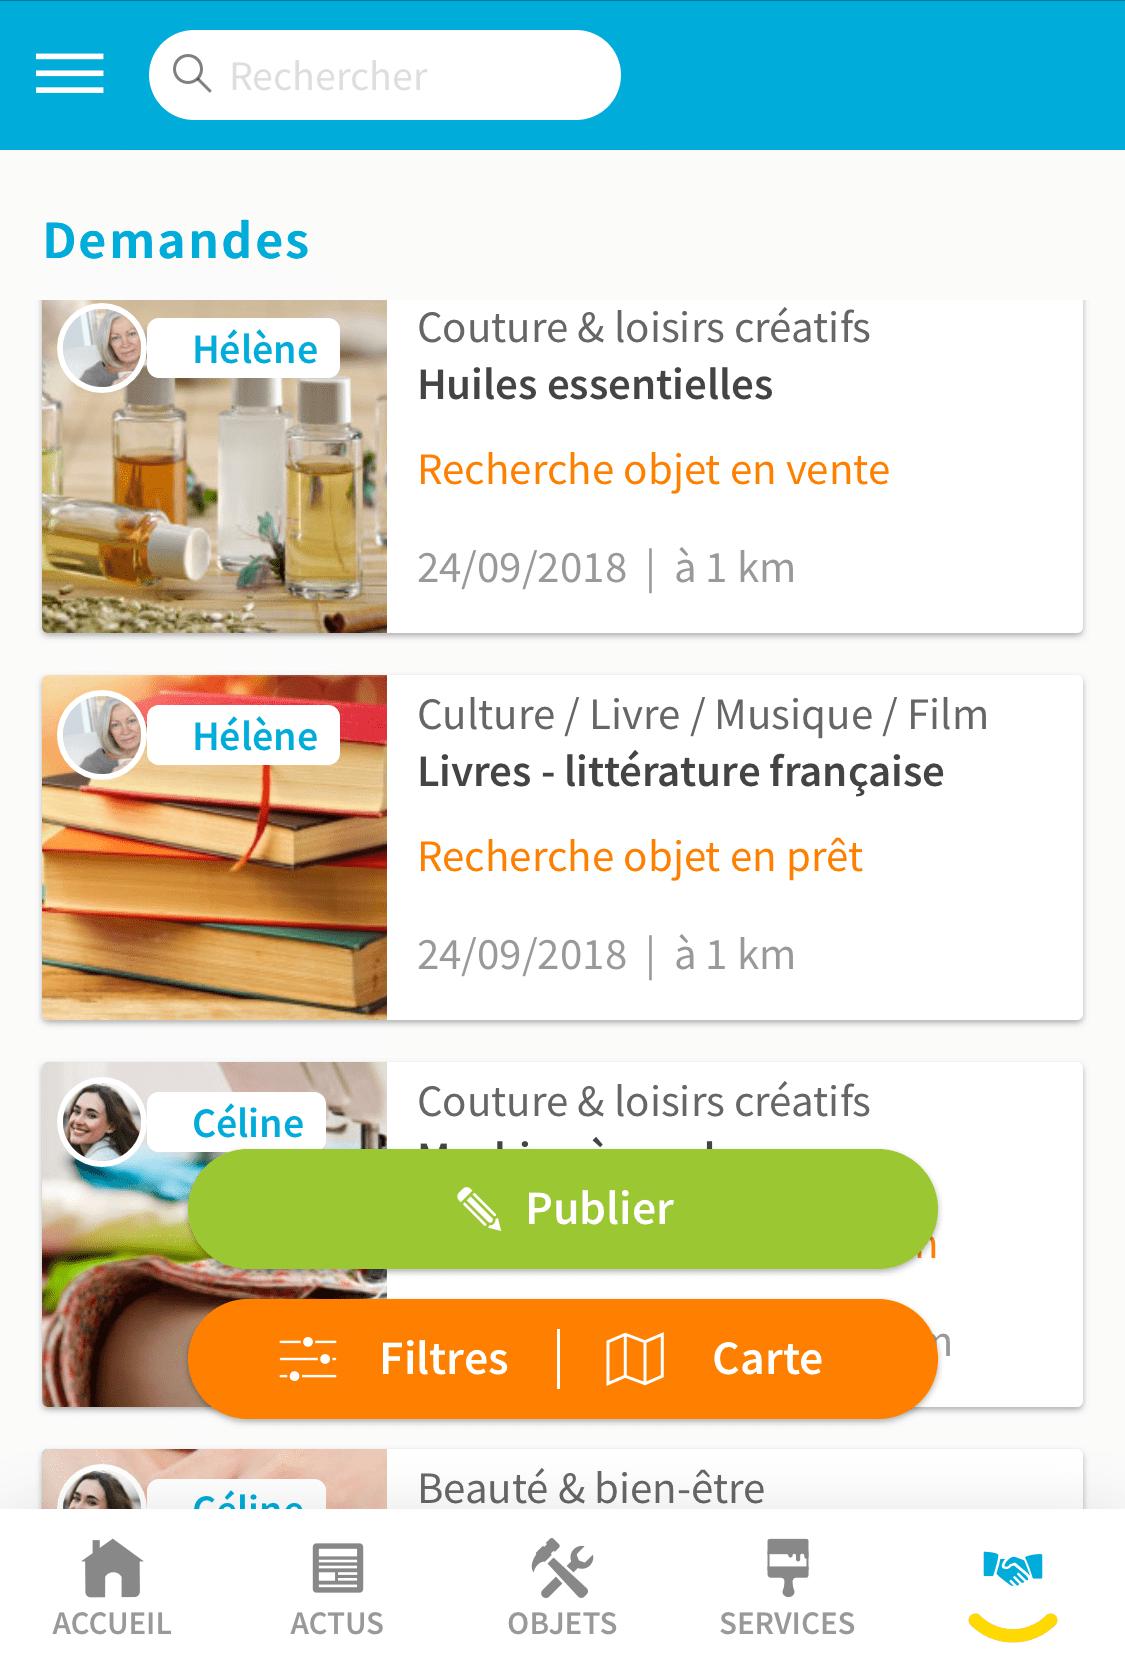 Demandes Mobile